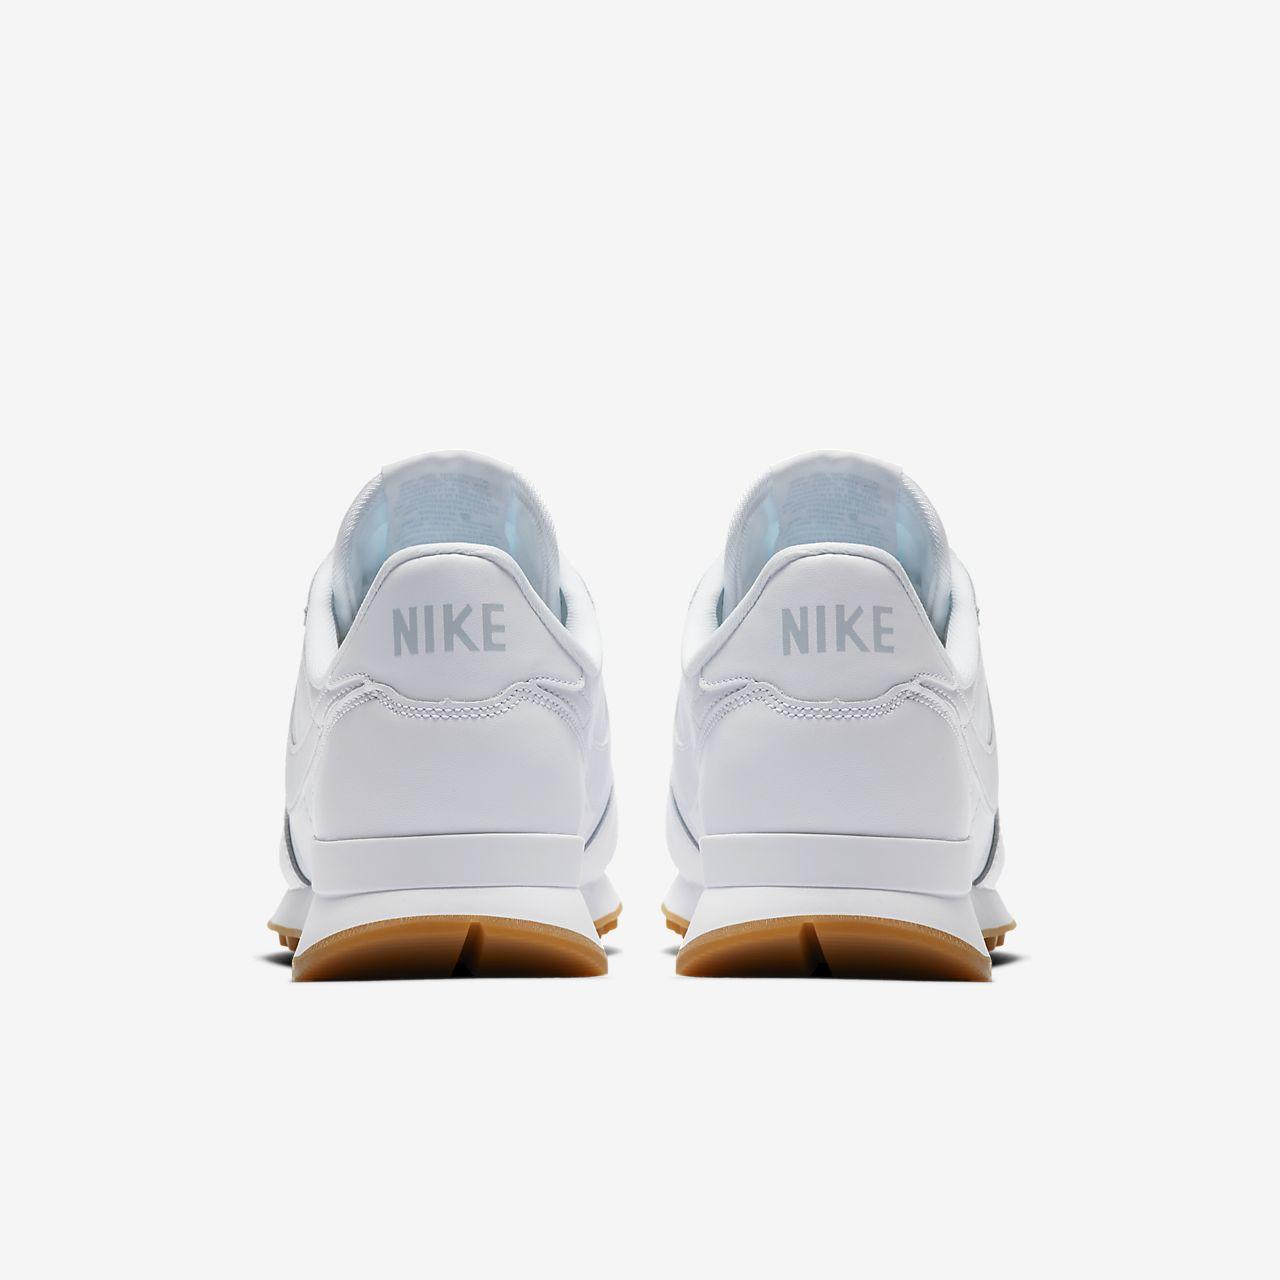 best website 897d5 4cfb4 Low Resolution Nike Internationalist Women s Shoe Nike Internationalist  Women s Shoe